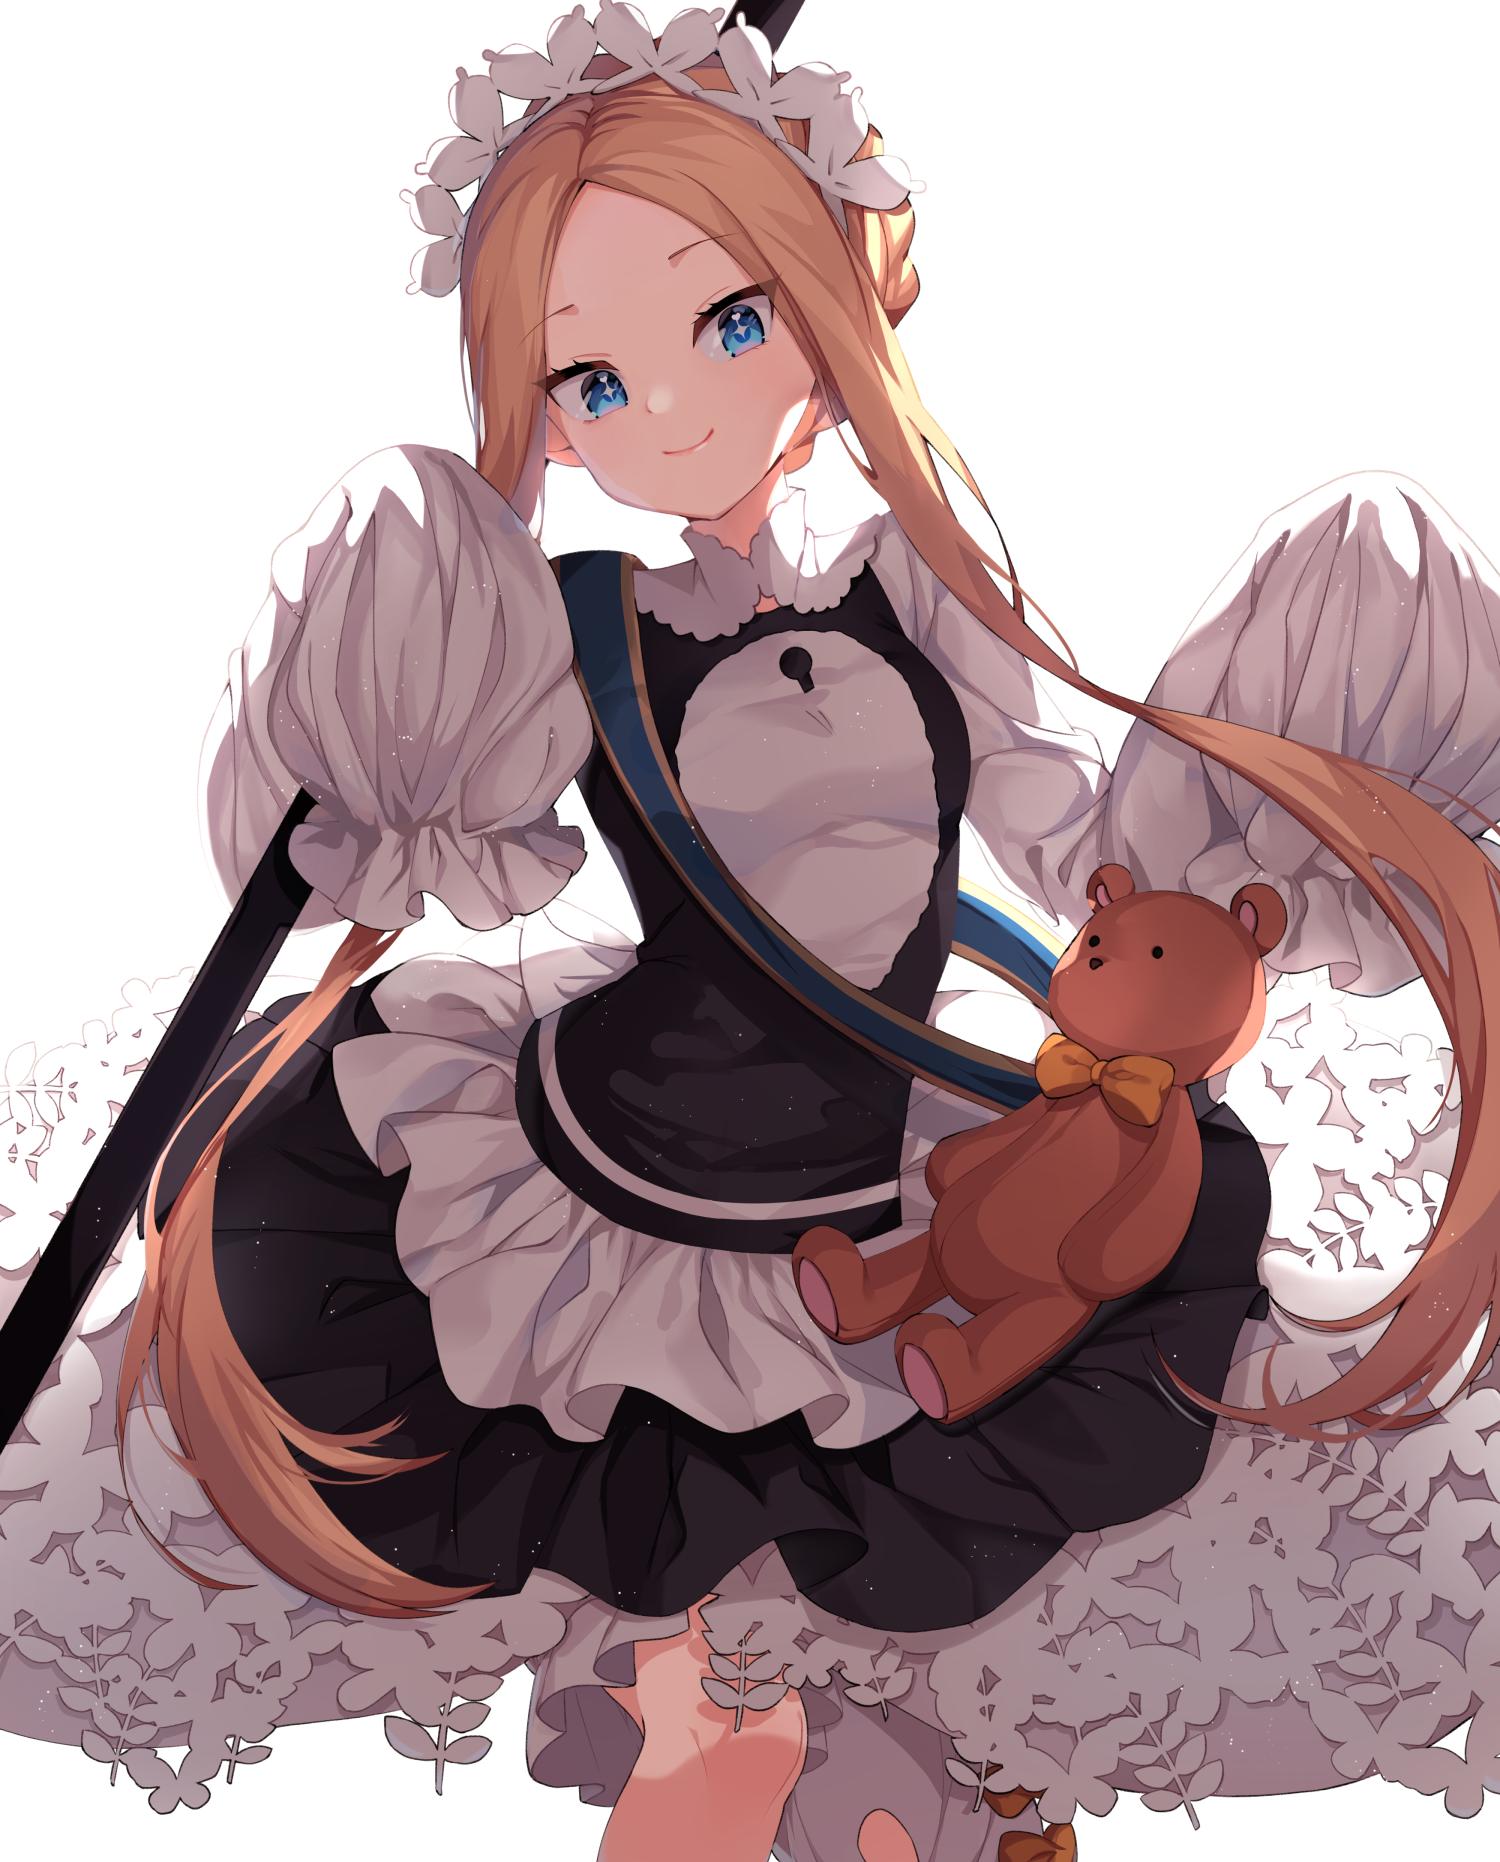 Fluffy Abigail [Fate/Grand Order]